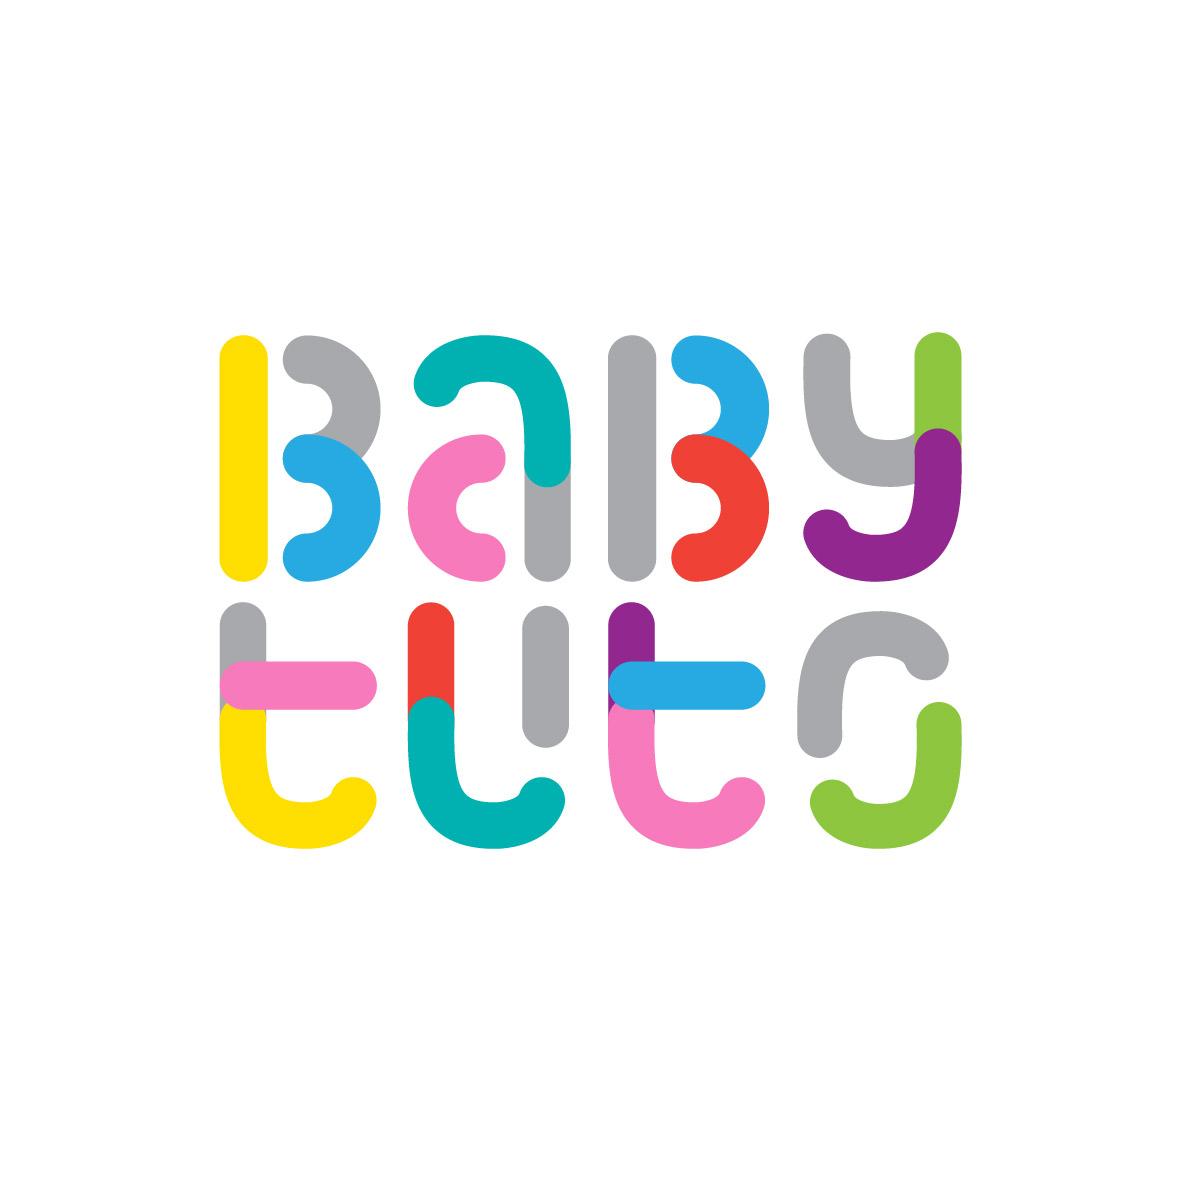 Empresas Desafio10x: Babytuto